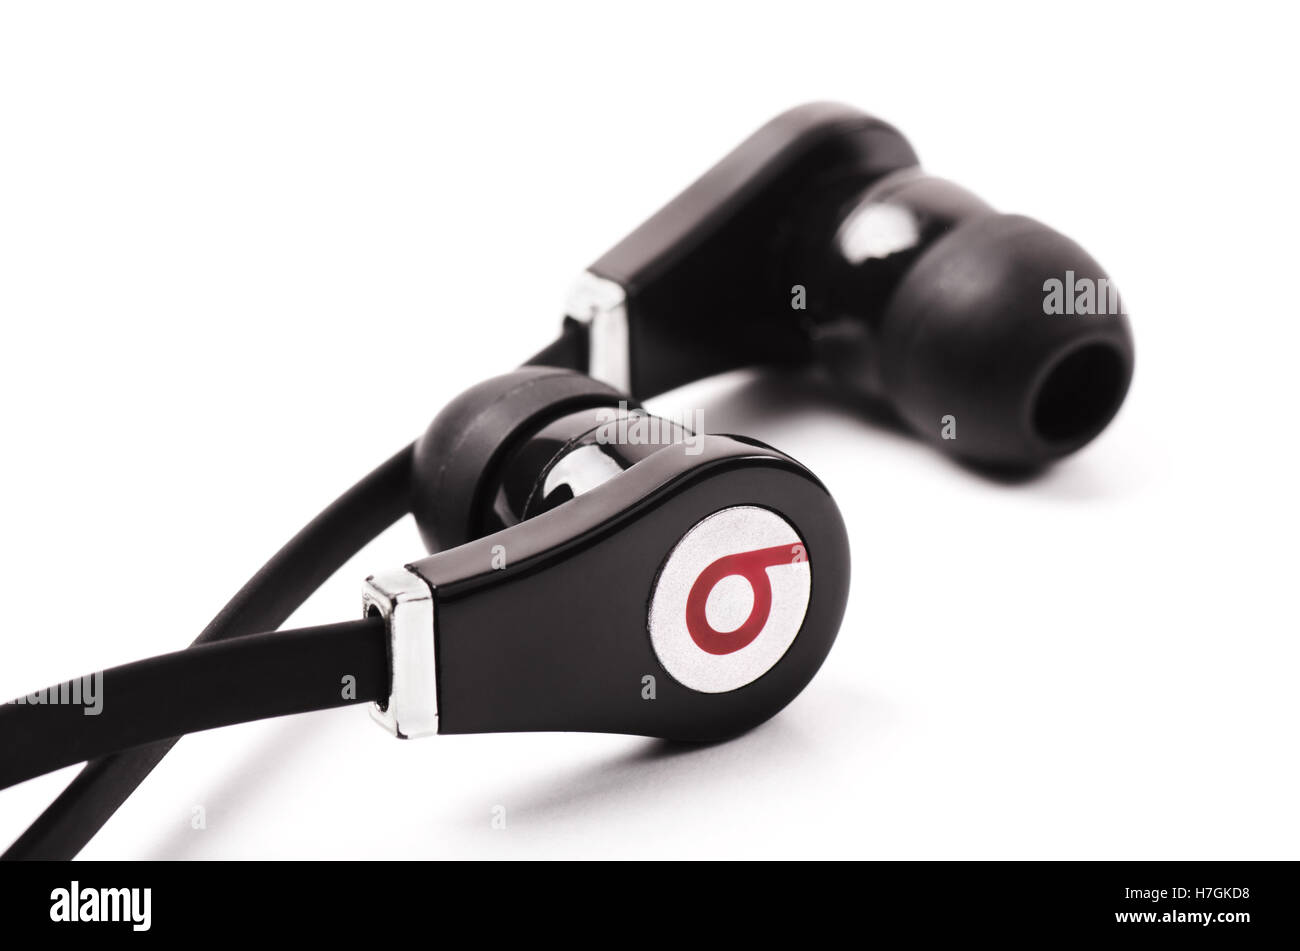 SAMARA, RUSSIA - SEPTEMBER 10, 2016: Black Beats audio headphones logo of the brand 'Beats Electronics' - Stock Image